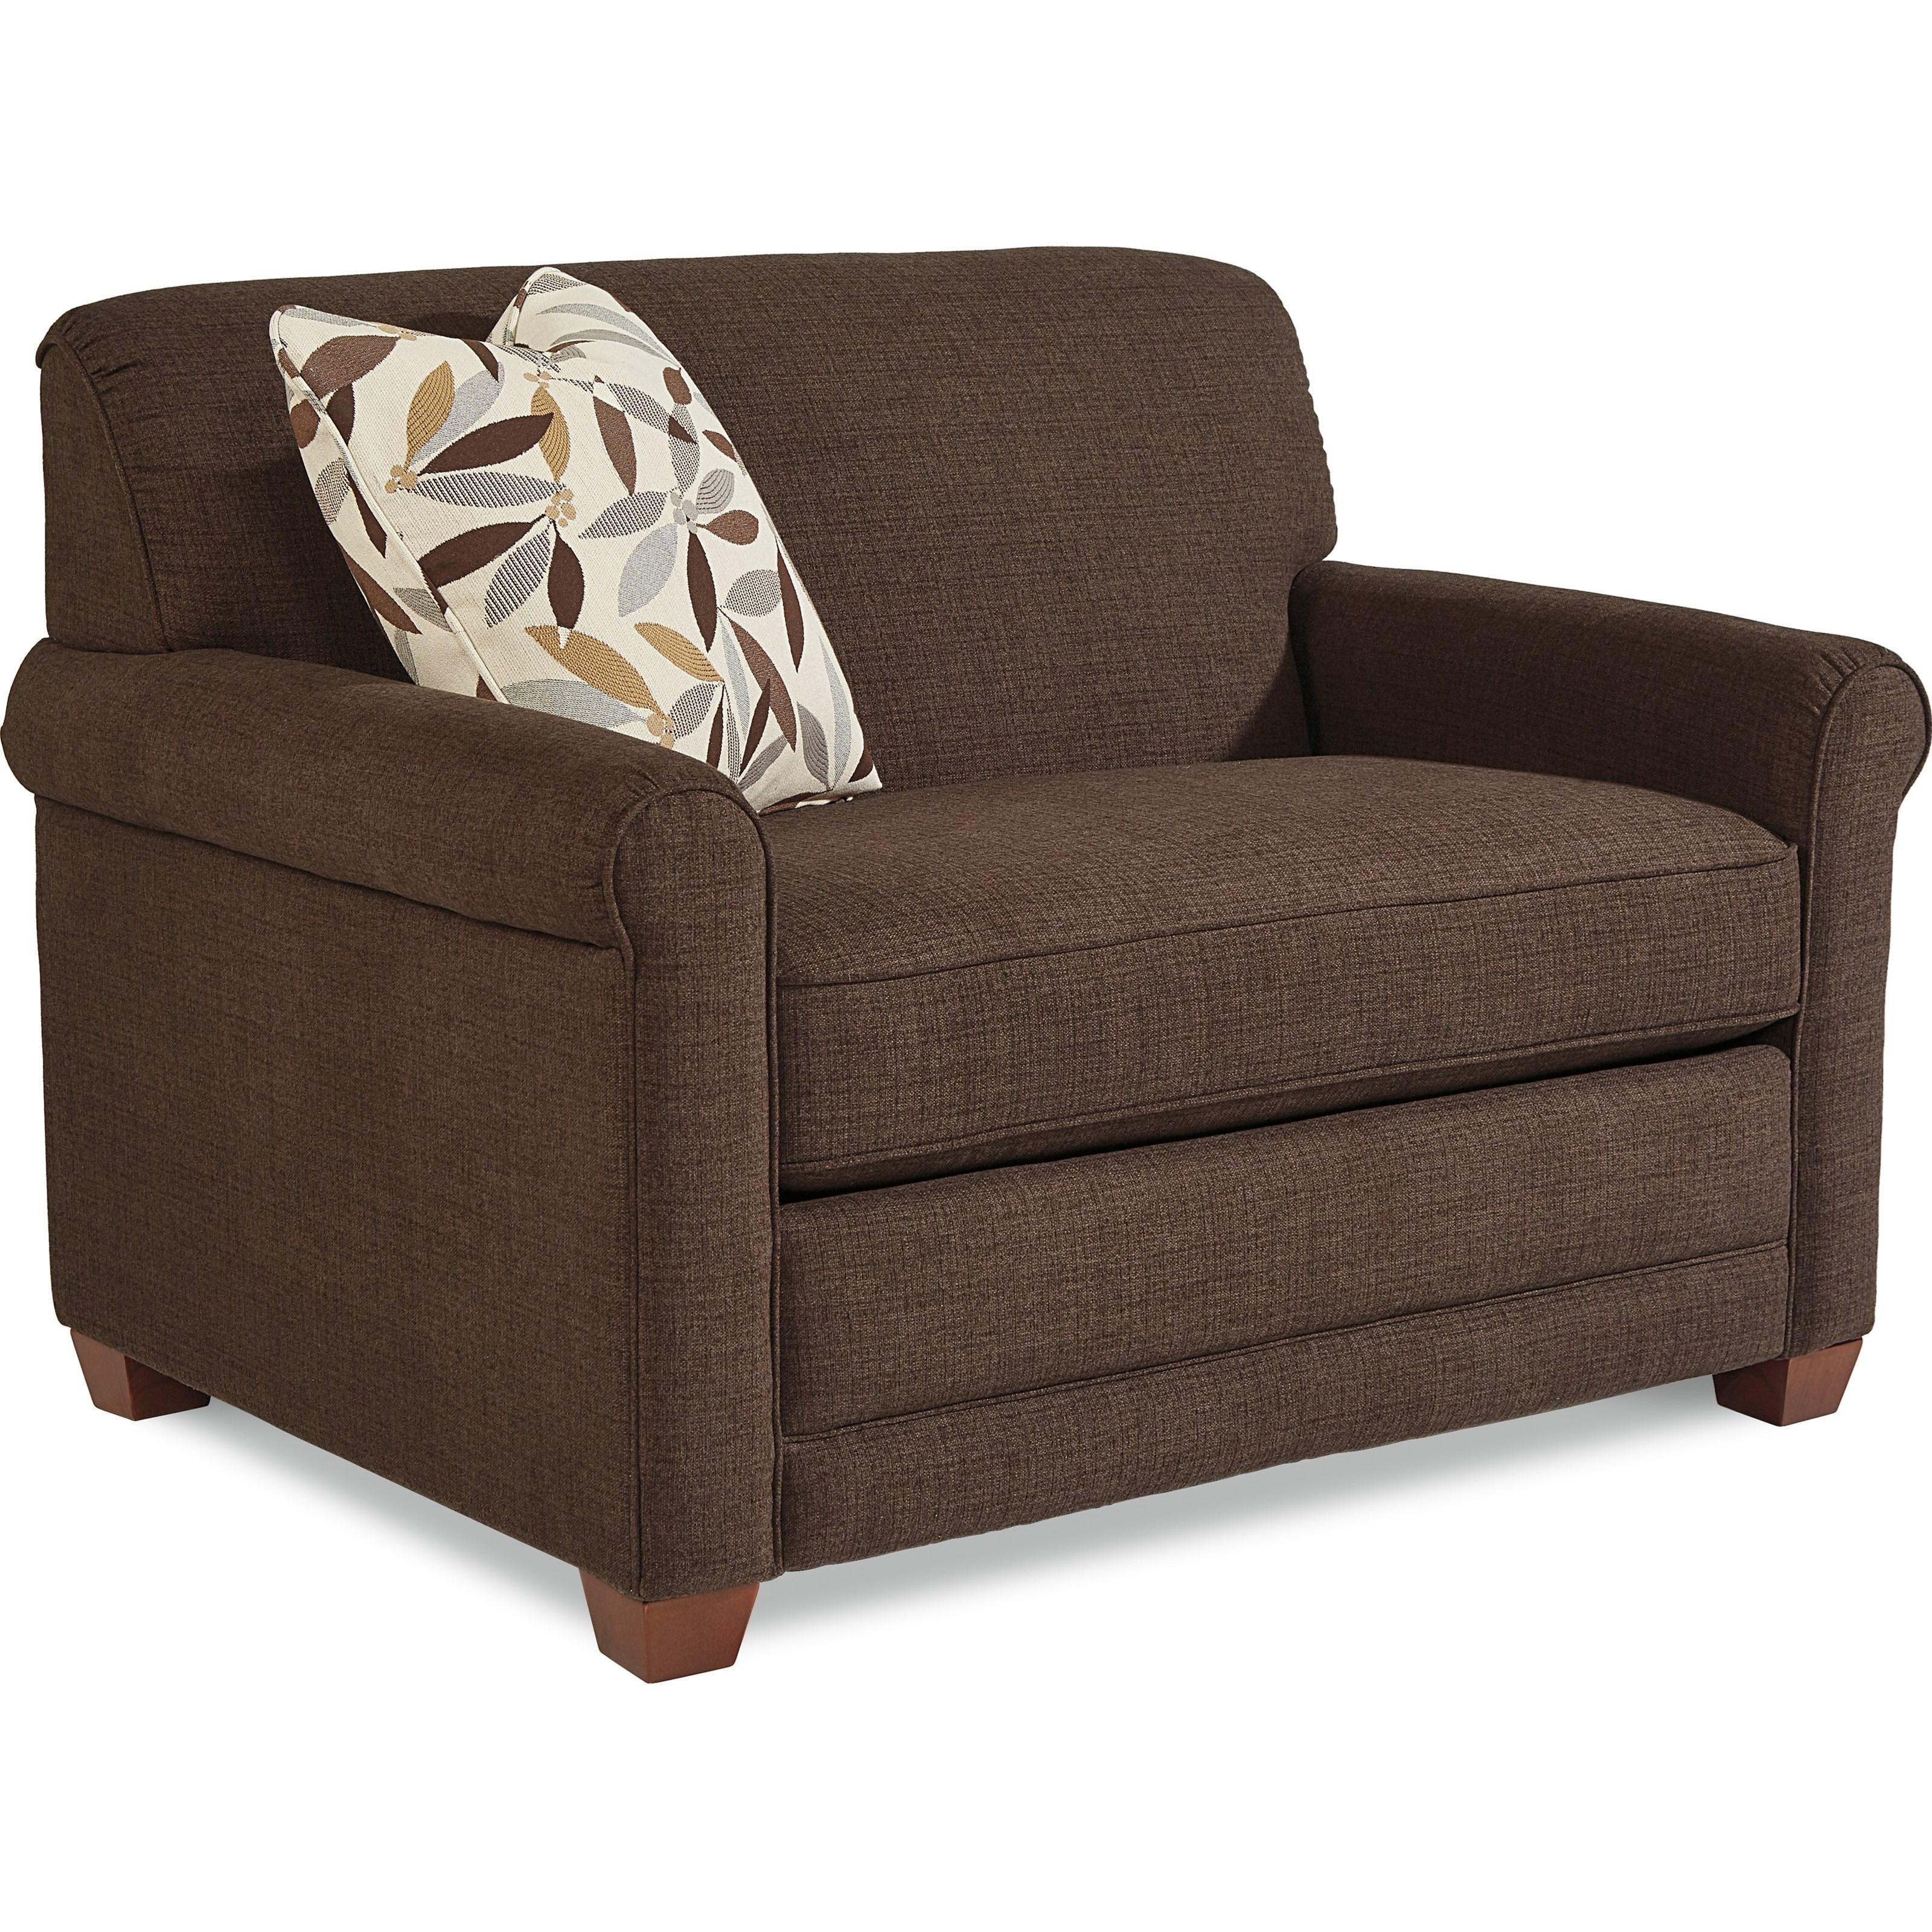 La Z Boy Amanda Casual Twin Mattress Sleeper Chair With